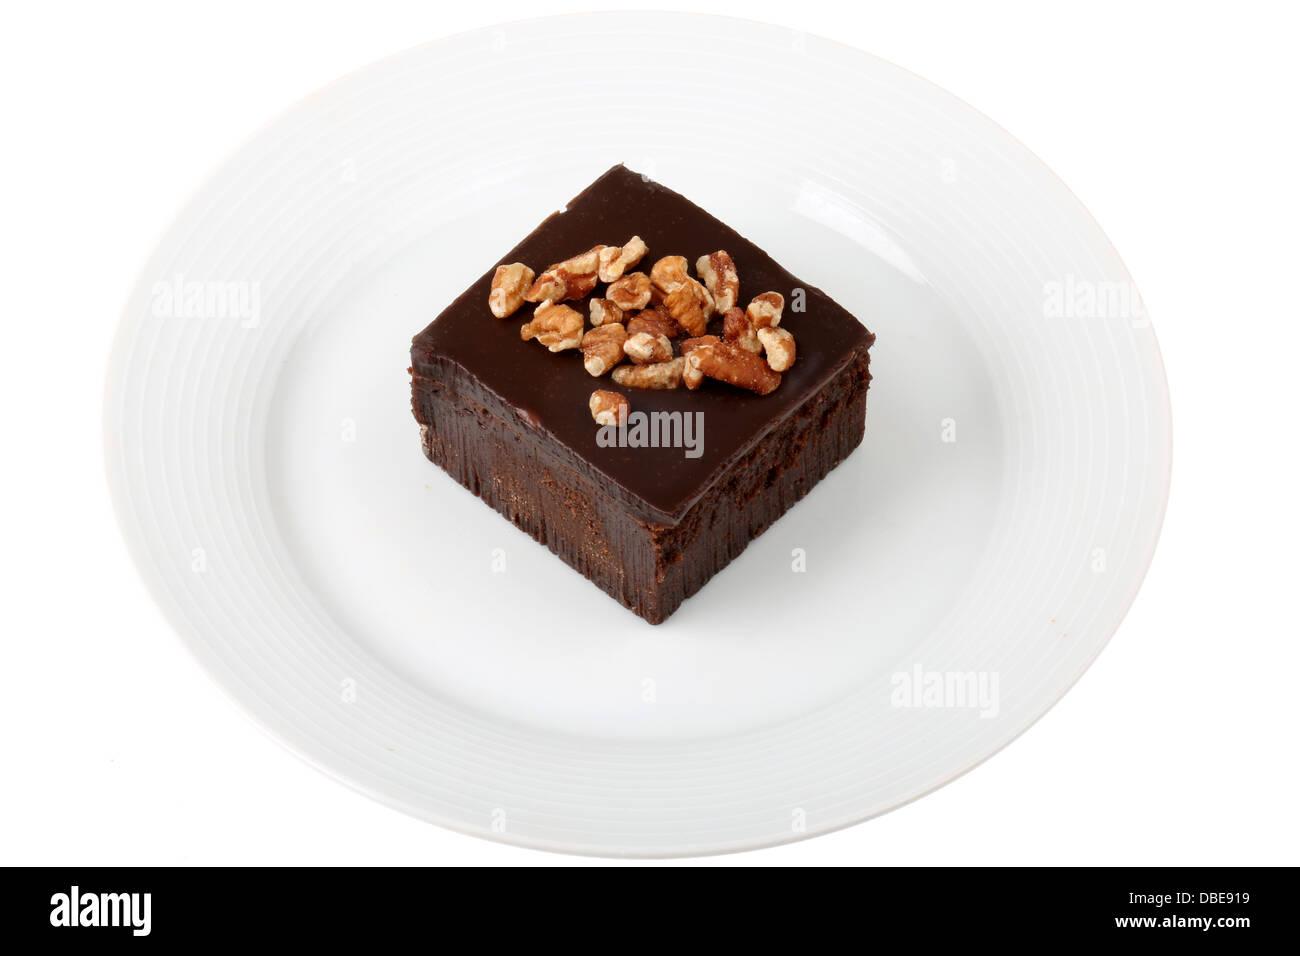 Chocolate Melts Stock Photo, Royalty Free Image: 58706741 - Alamy